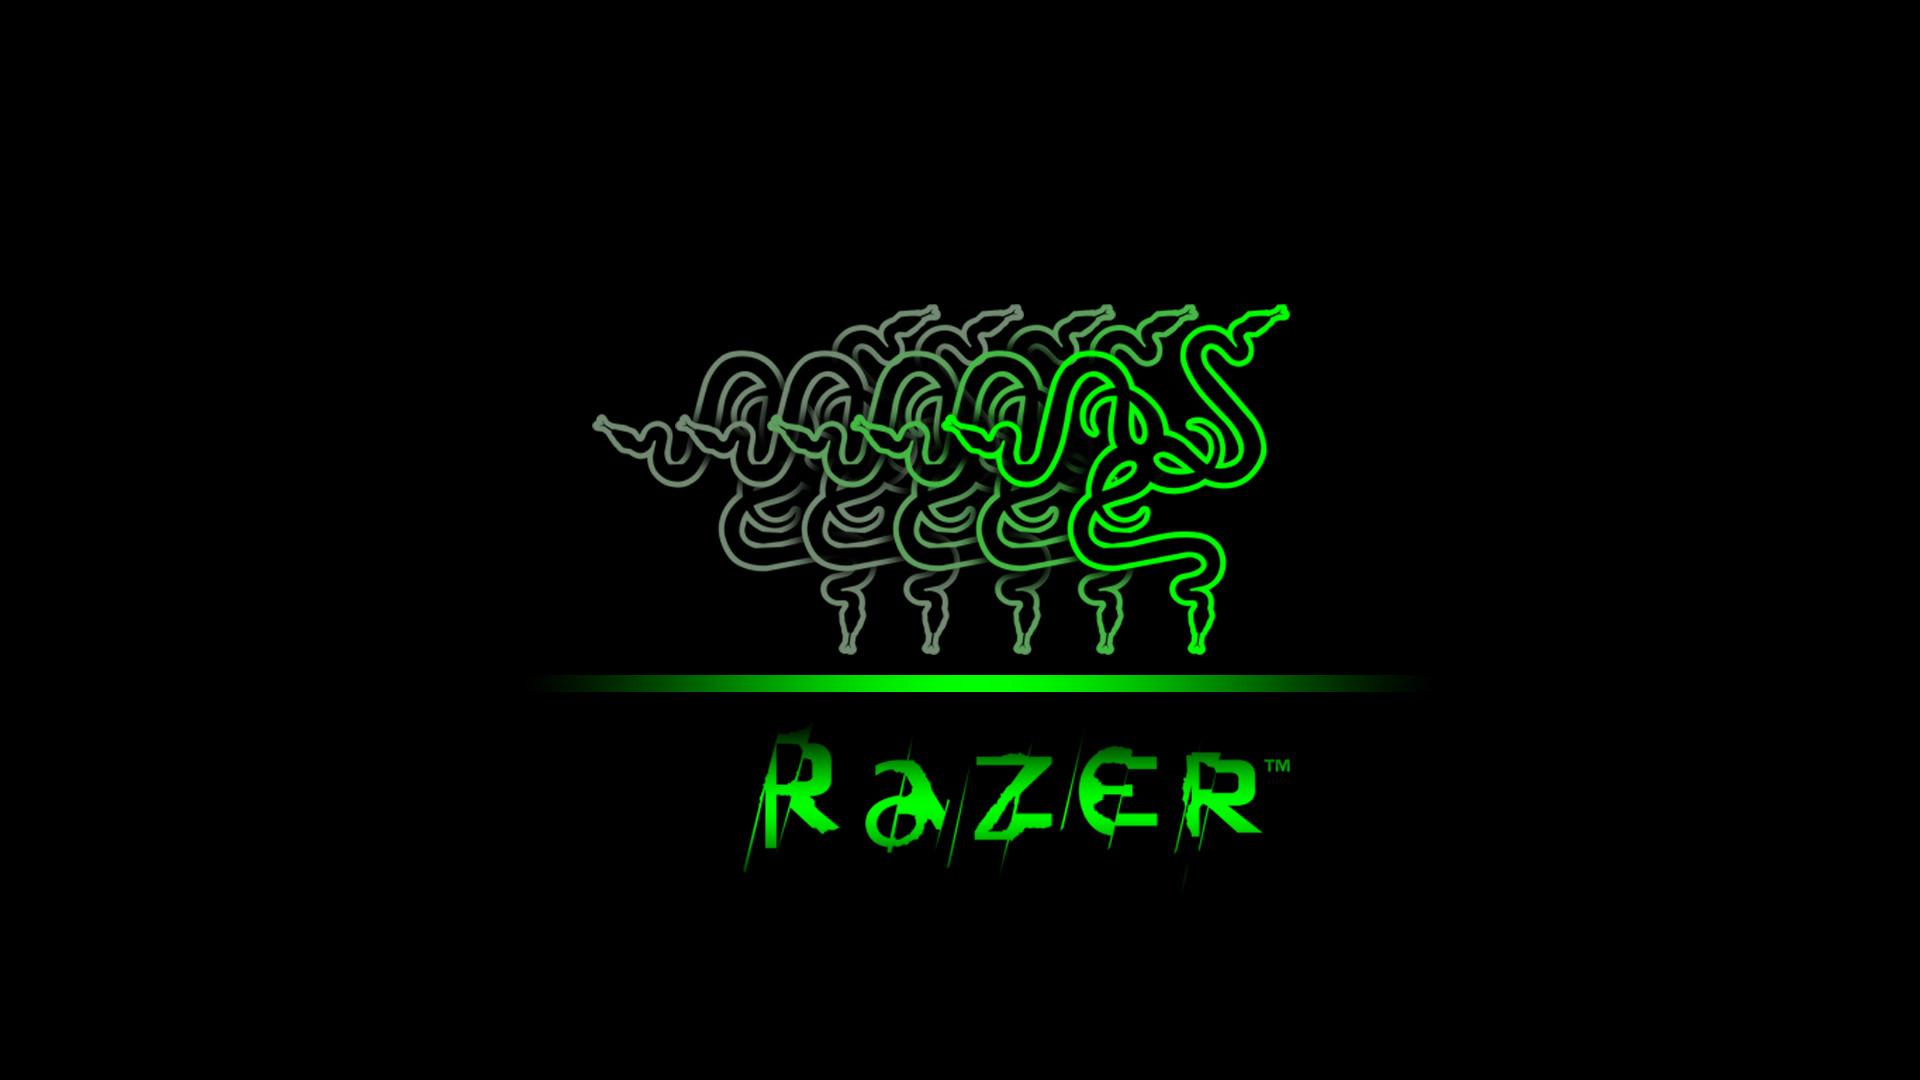 <b>Razer Wallpaper 1920×1080</b> HD – WallpaperSafari